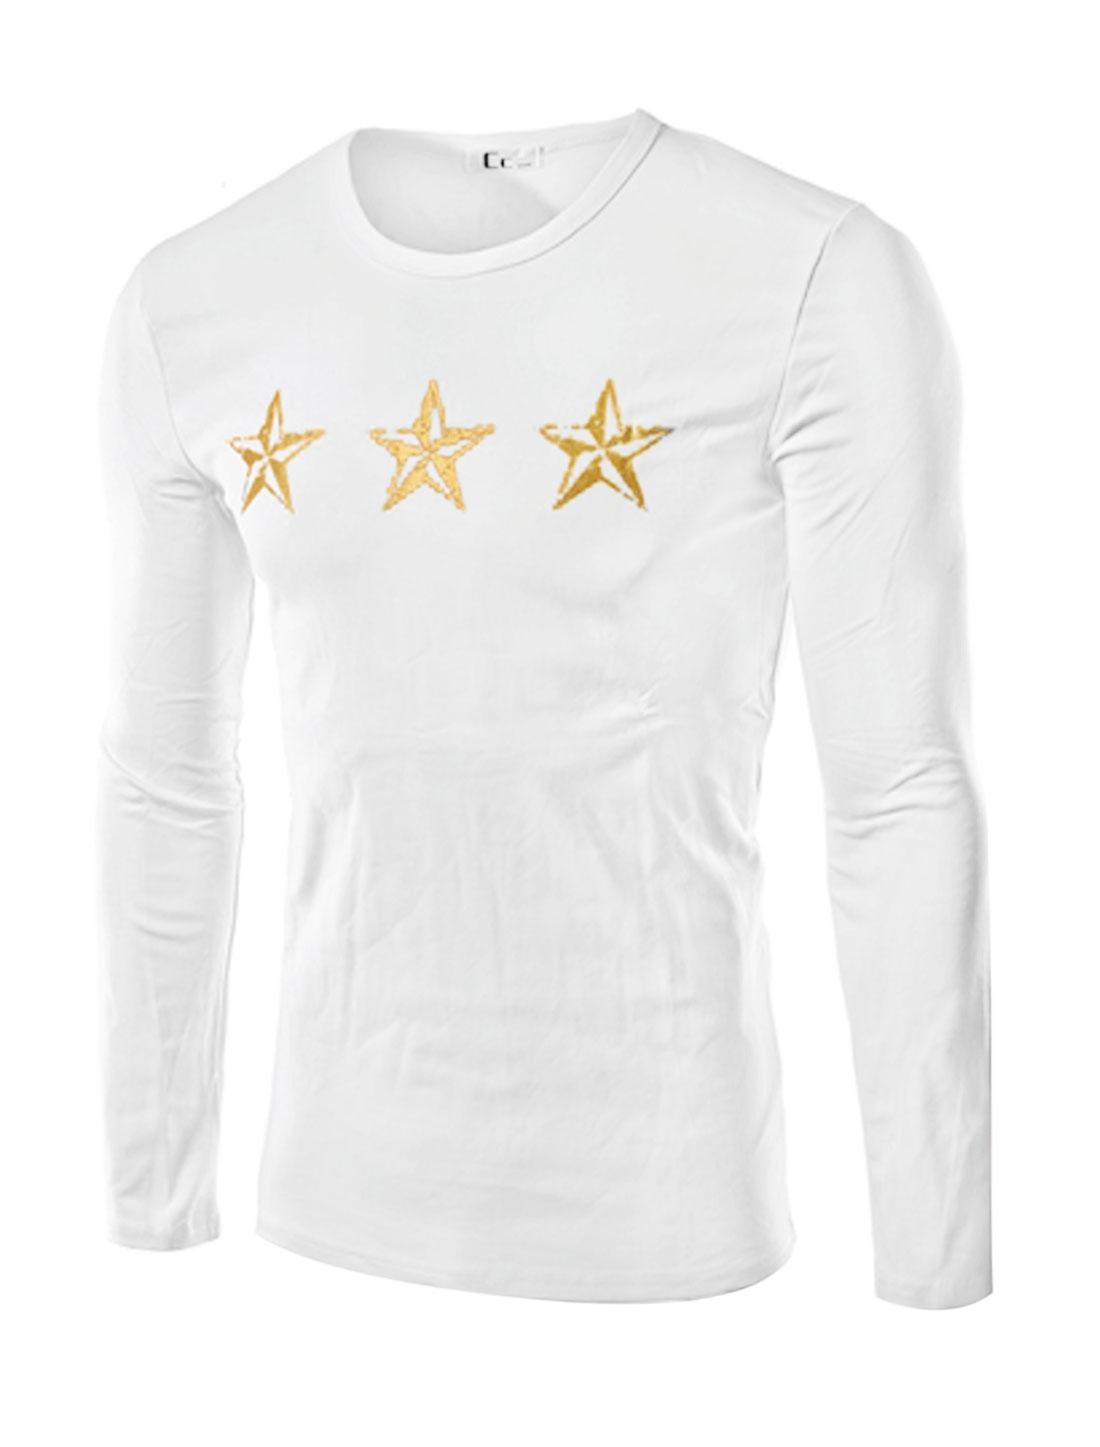 Men Crew Neck Stars Letters Slim Fit Tee Shirt White M